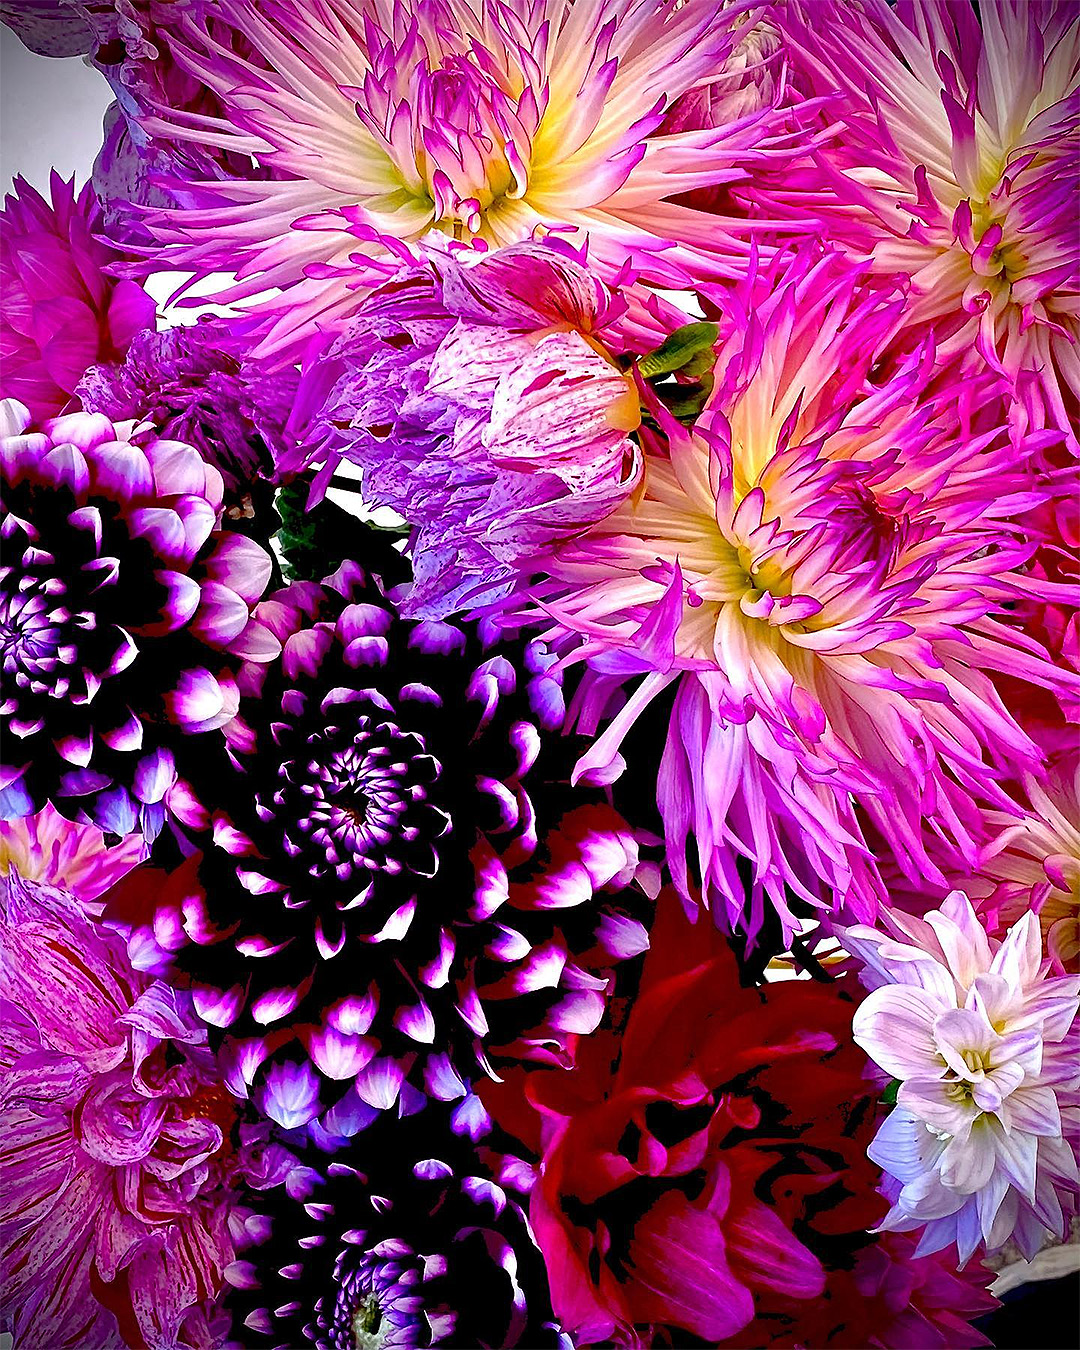 Wonderful purple flowers from Enchanted Rose Flowers.